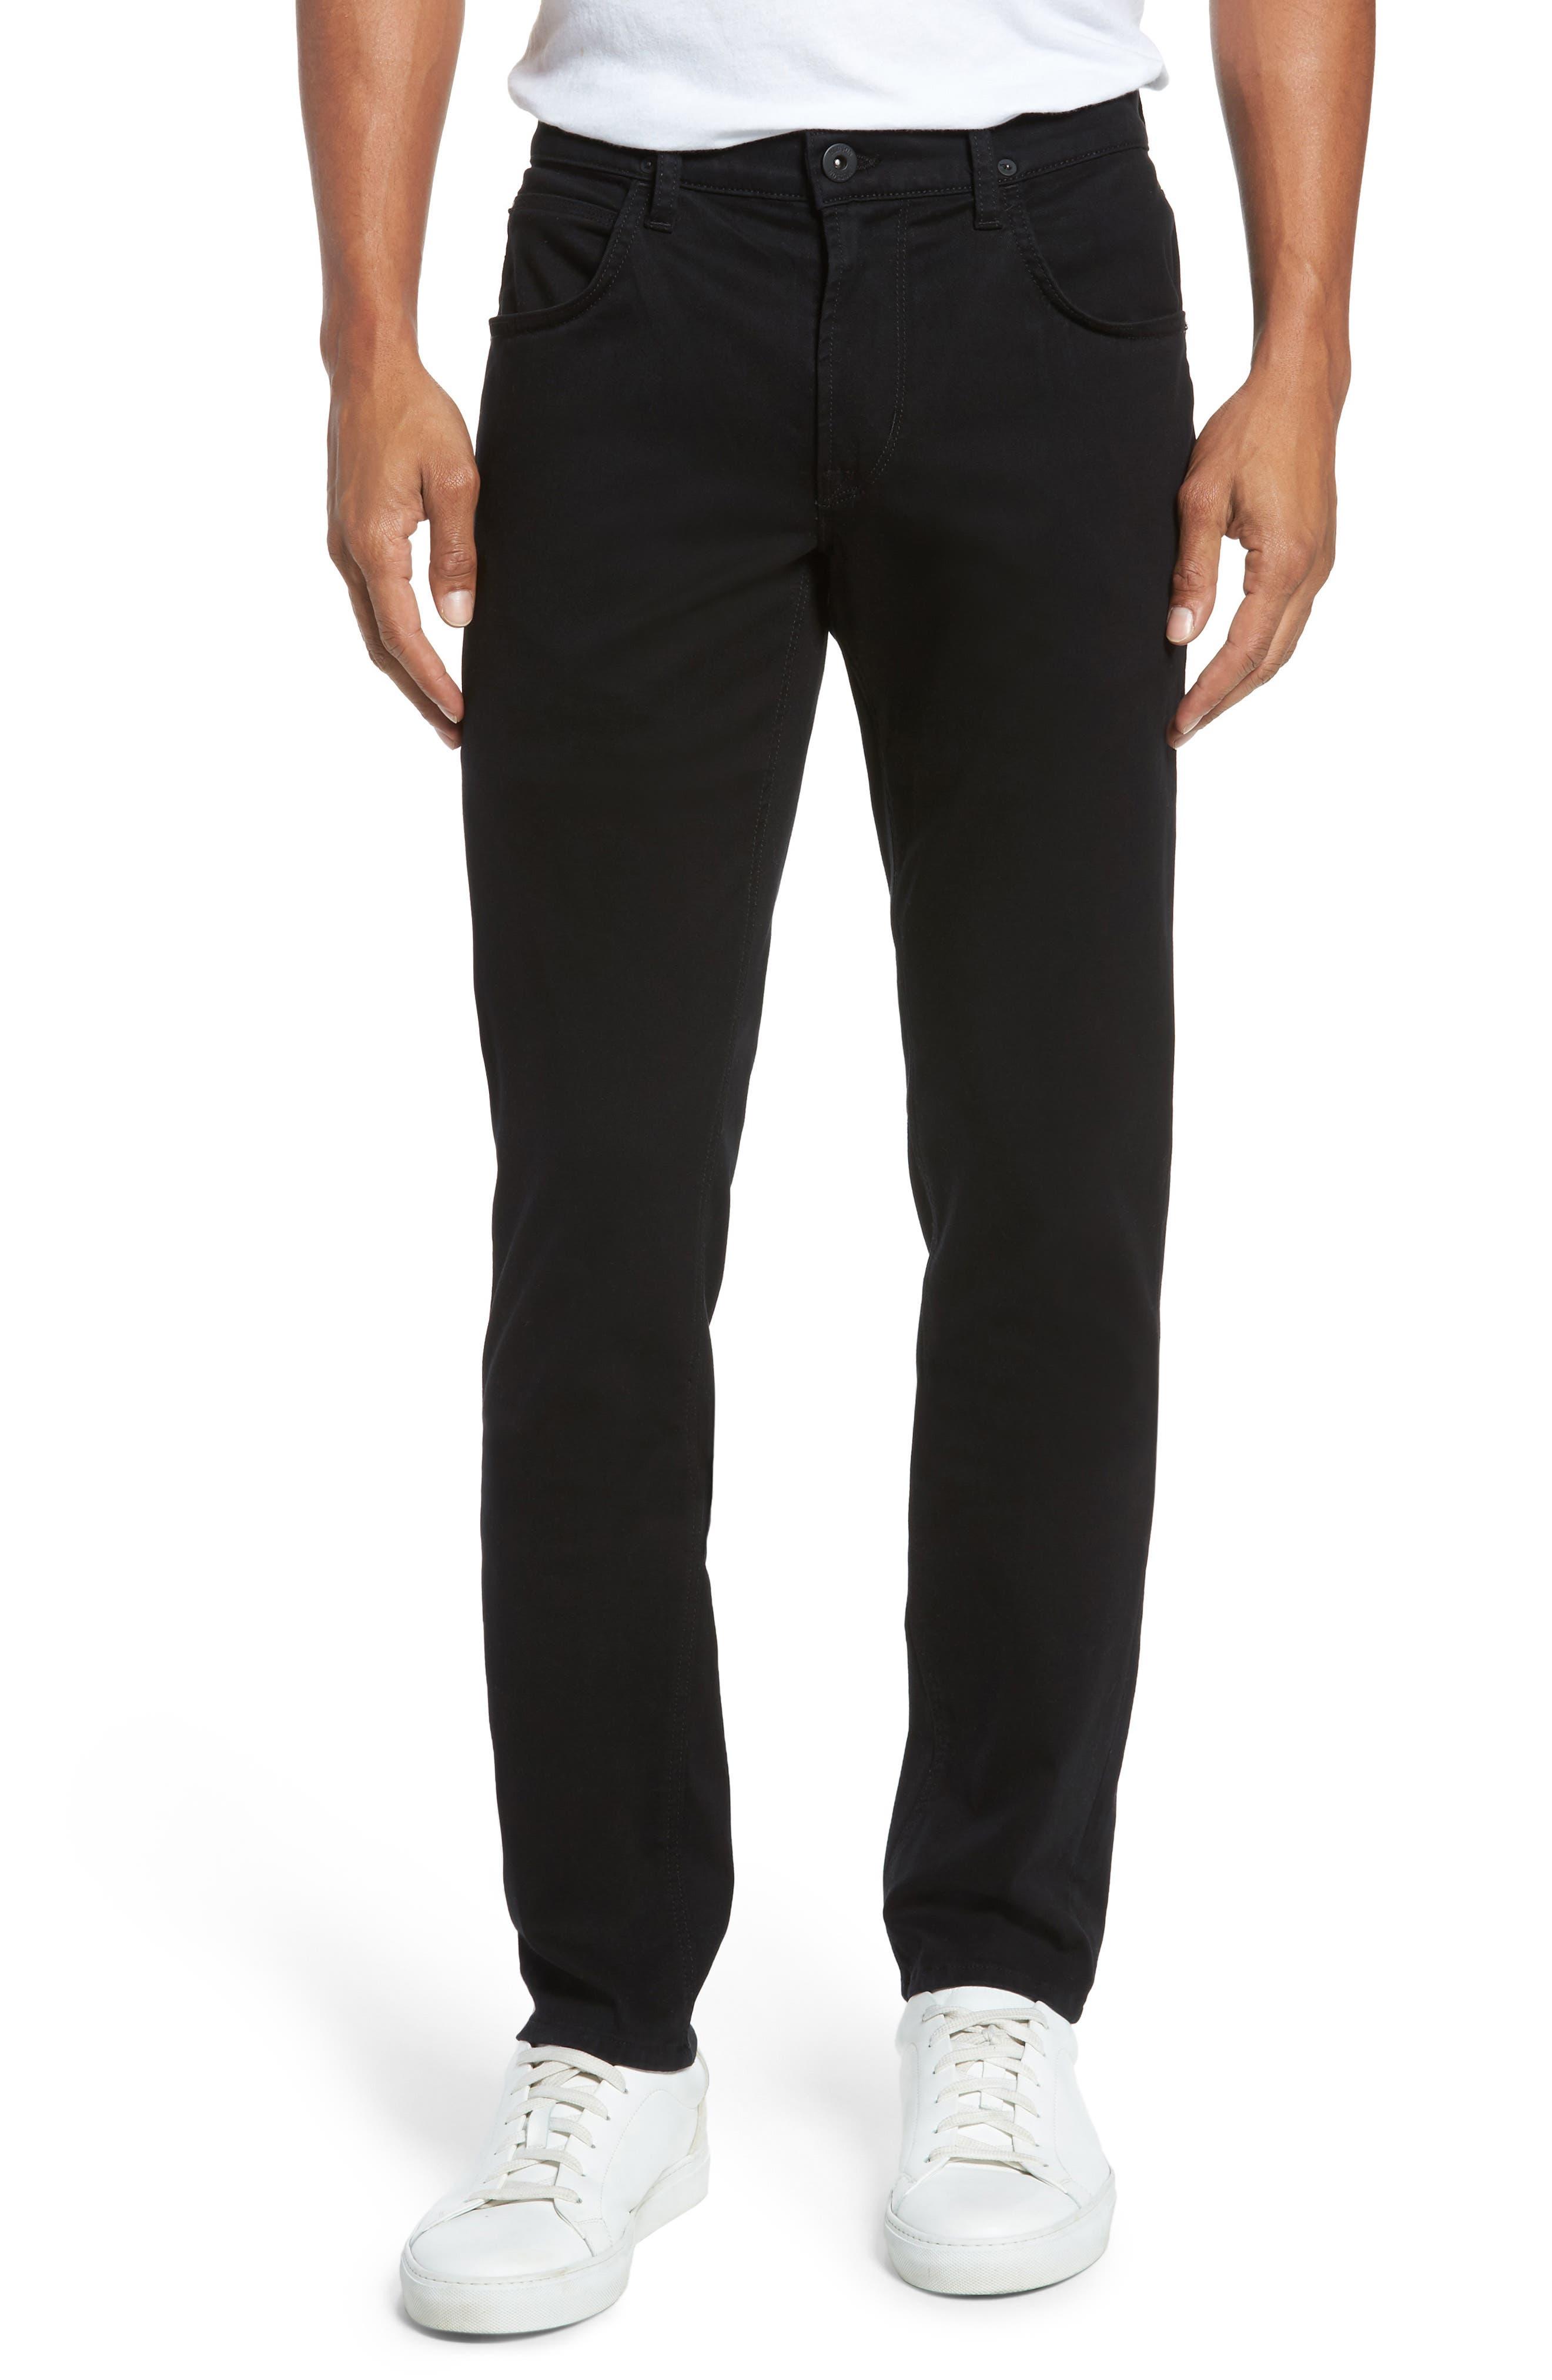 Blake Slim Fit Jeans,                         Main,                         color, Blackened